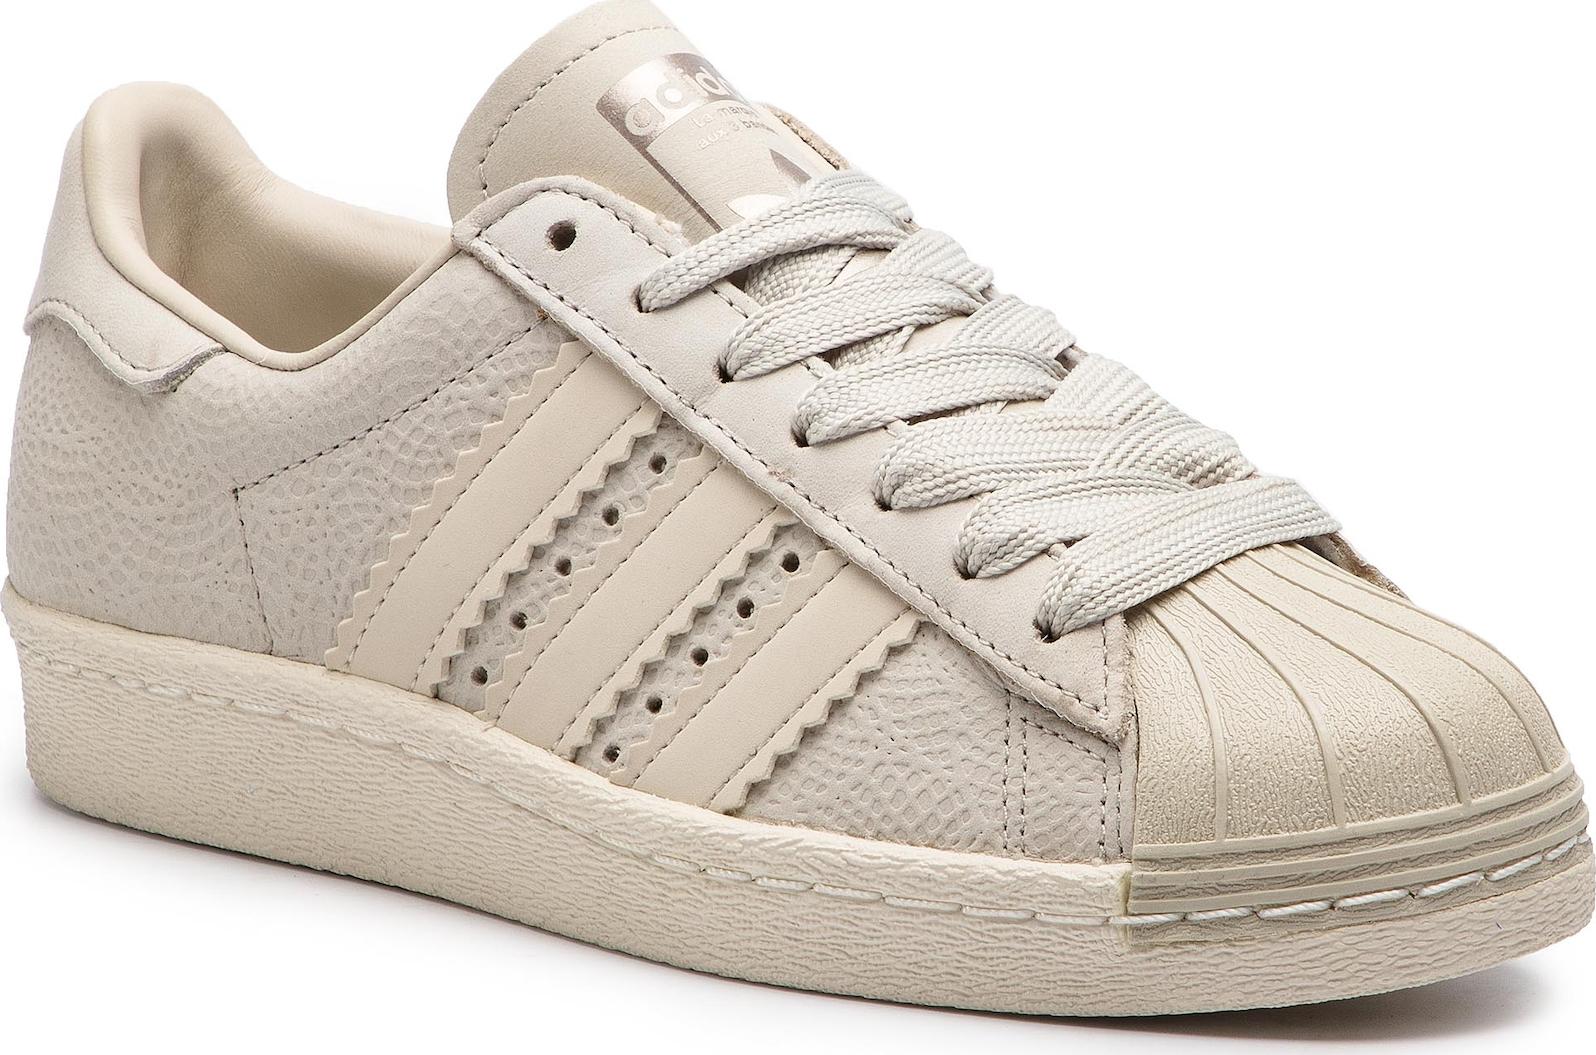 1d58e23f6bf Προσθήκη στα αγαπημένα menu Adidas Superstar 80s